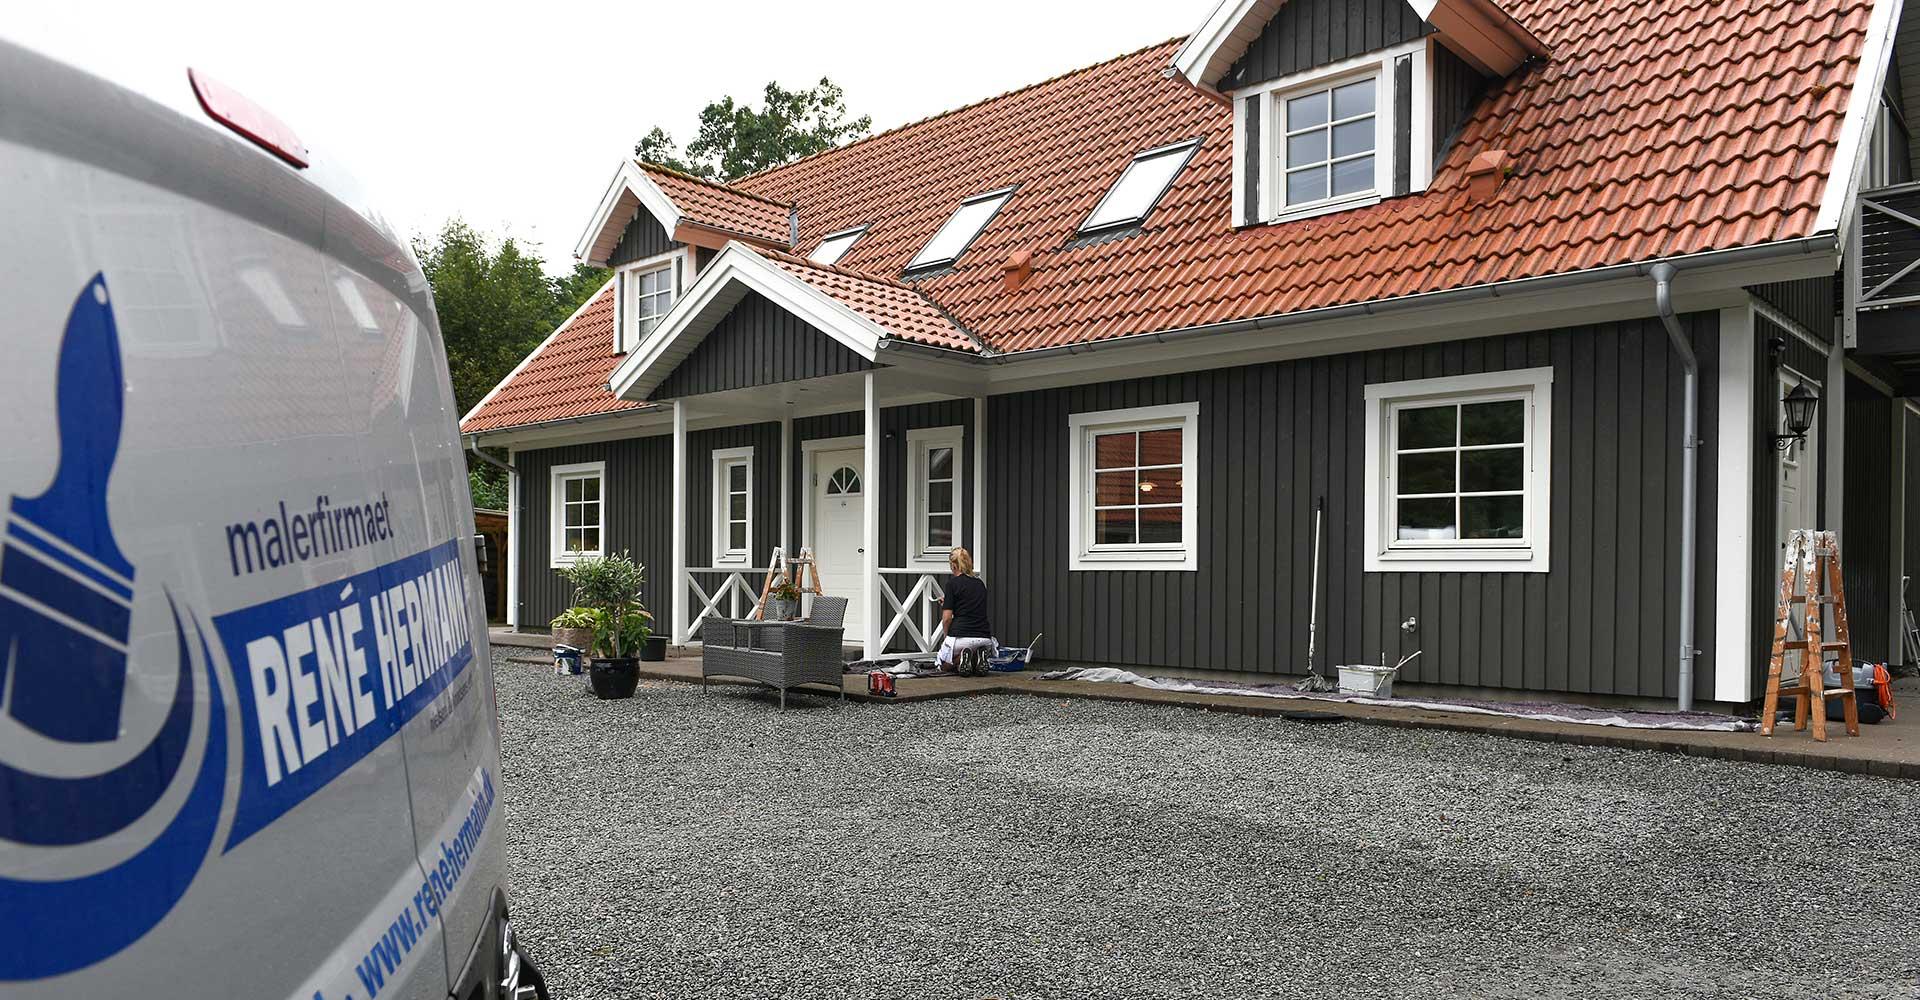 Malerfirma Viborg